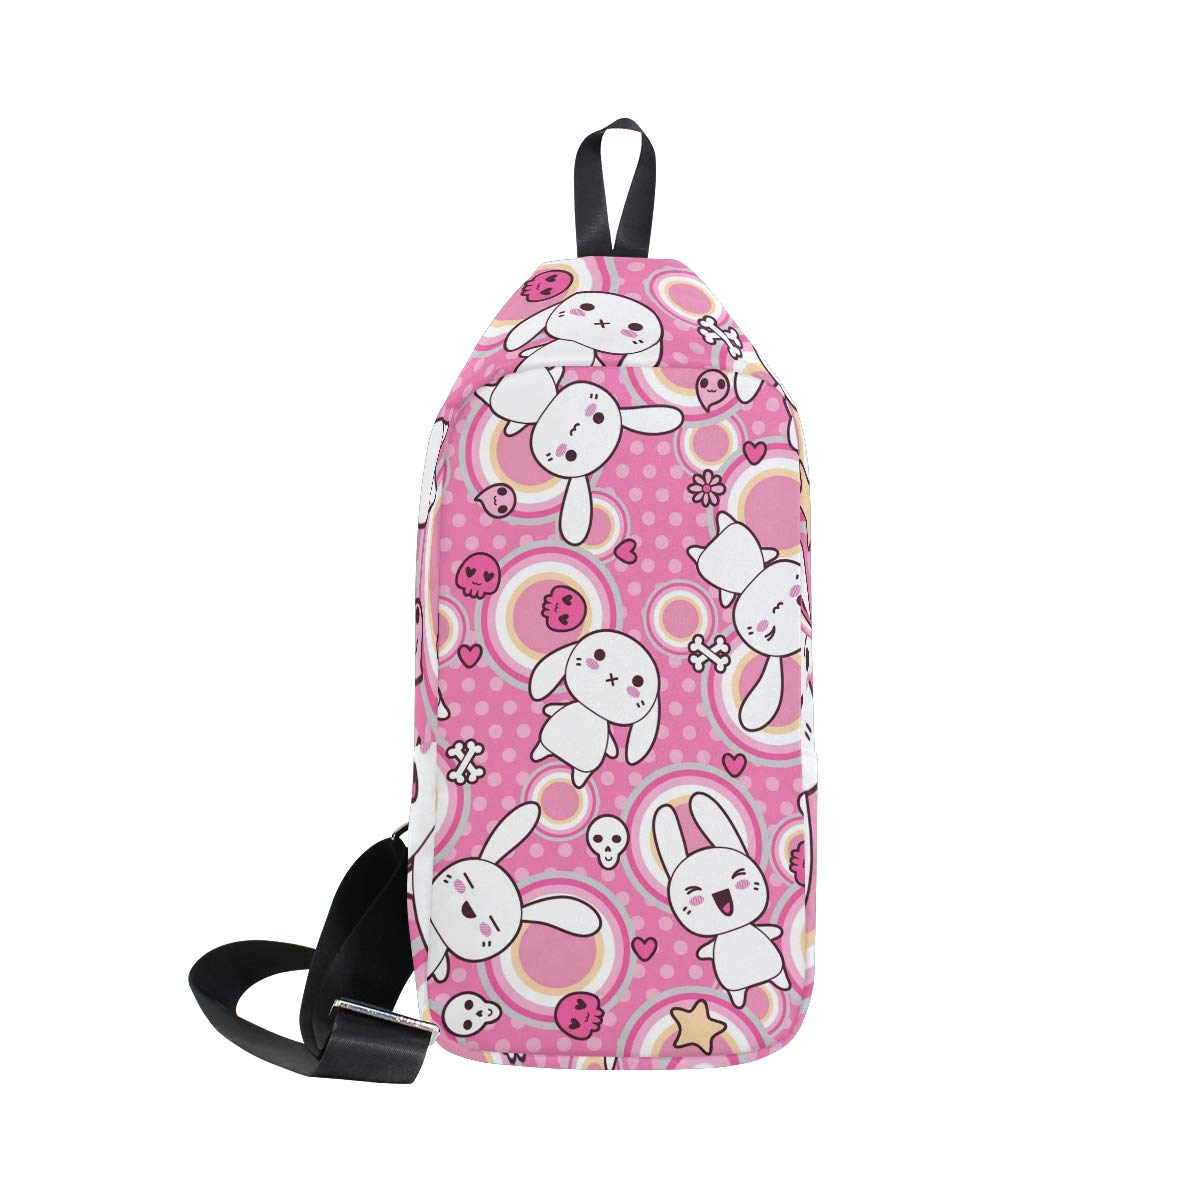 Unisex Messenger Bag Rabbit Sulku Circle Dot Shoulder Chest Cross Body Backpack Bag